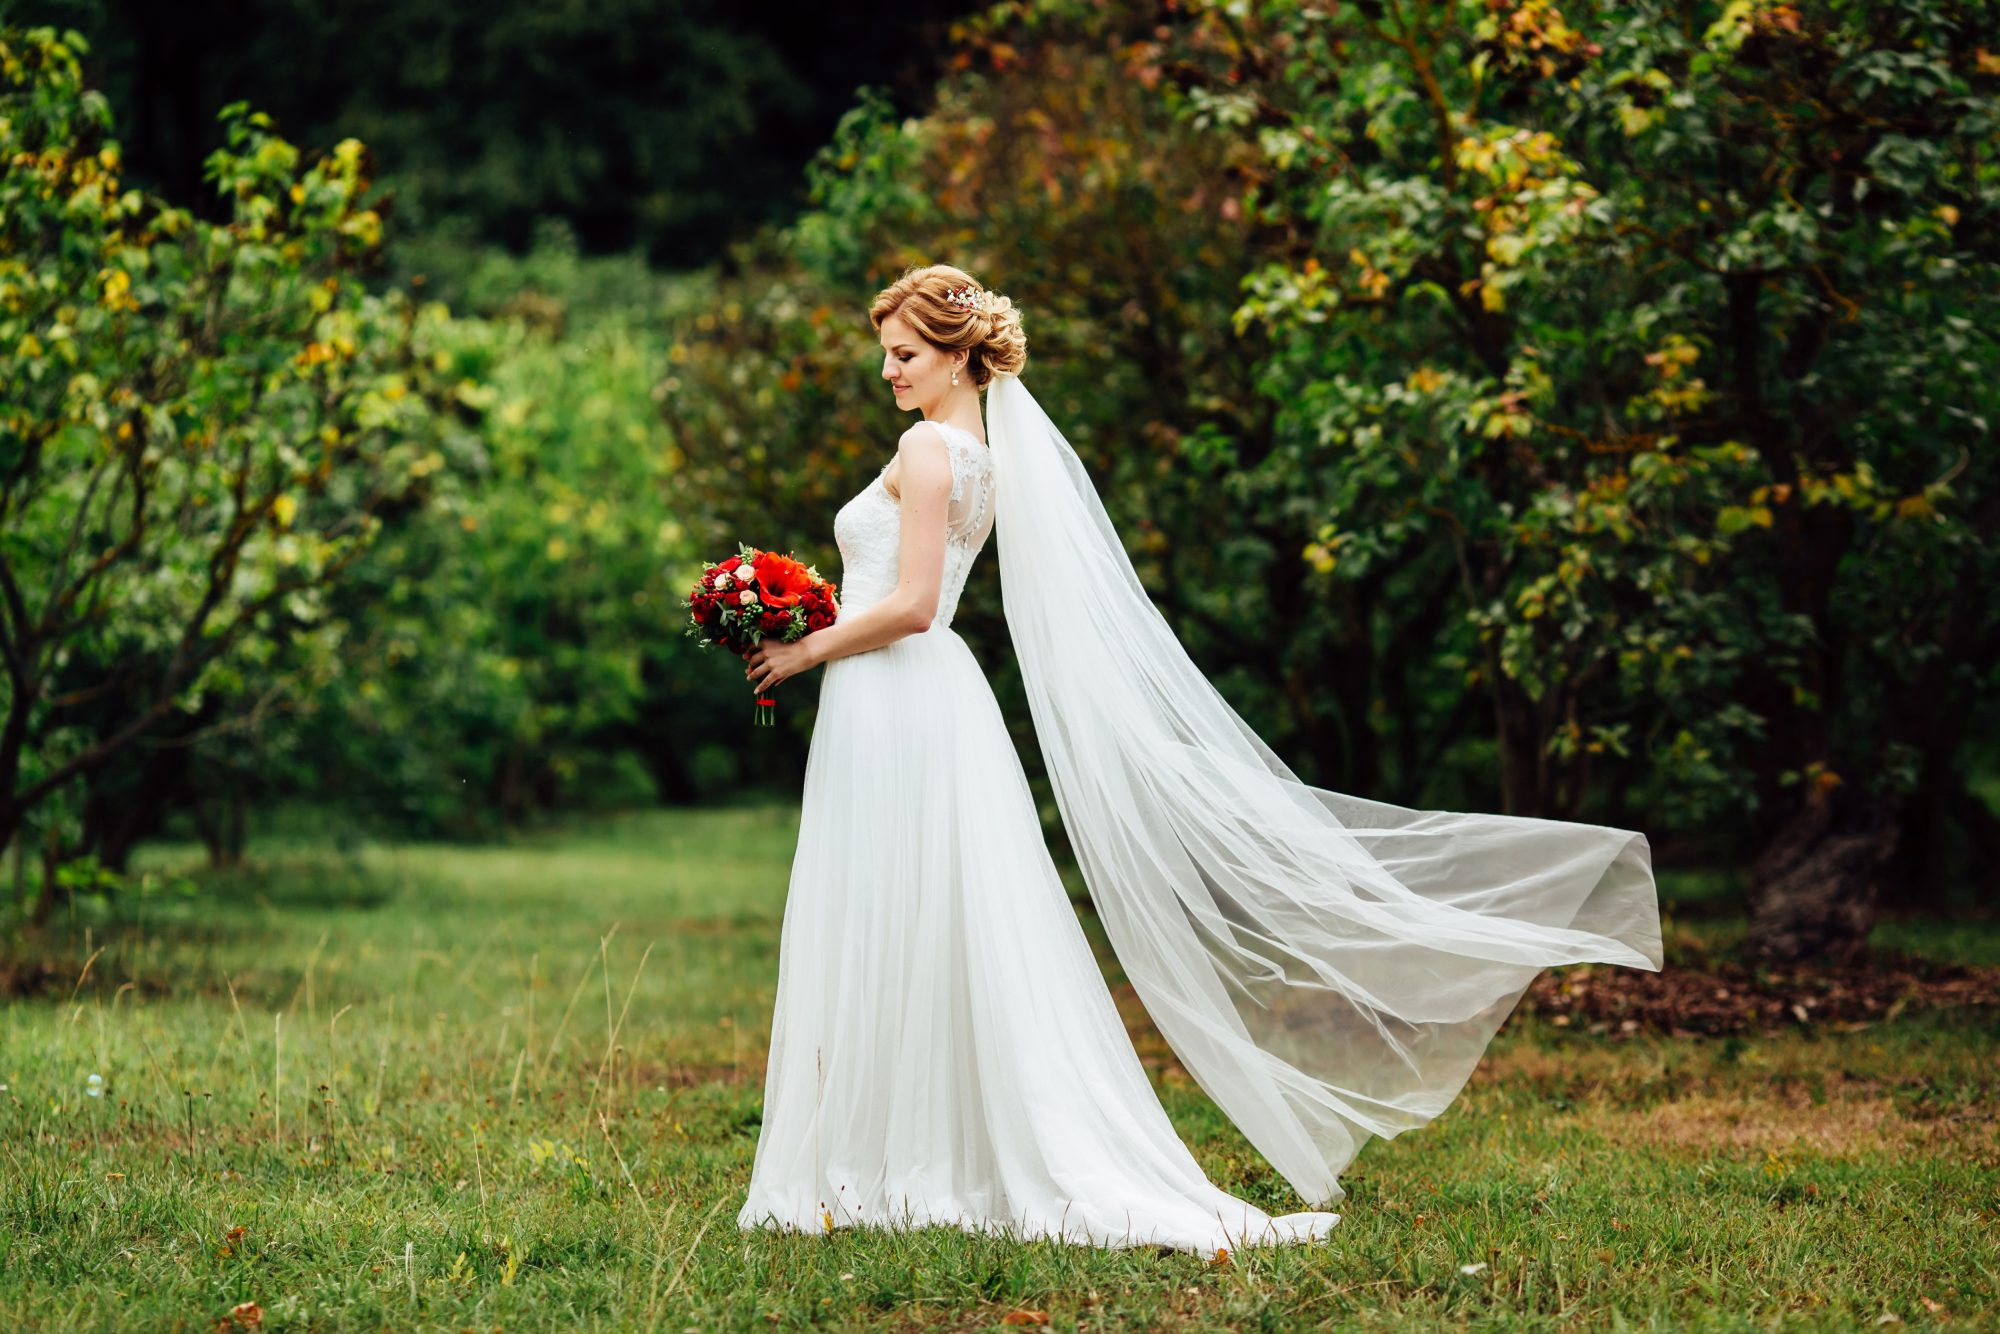 wedding veil to mid calf